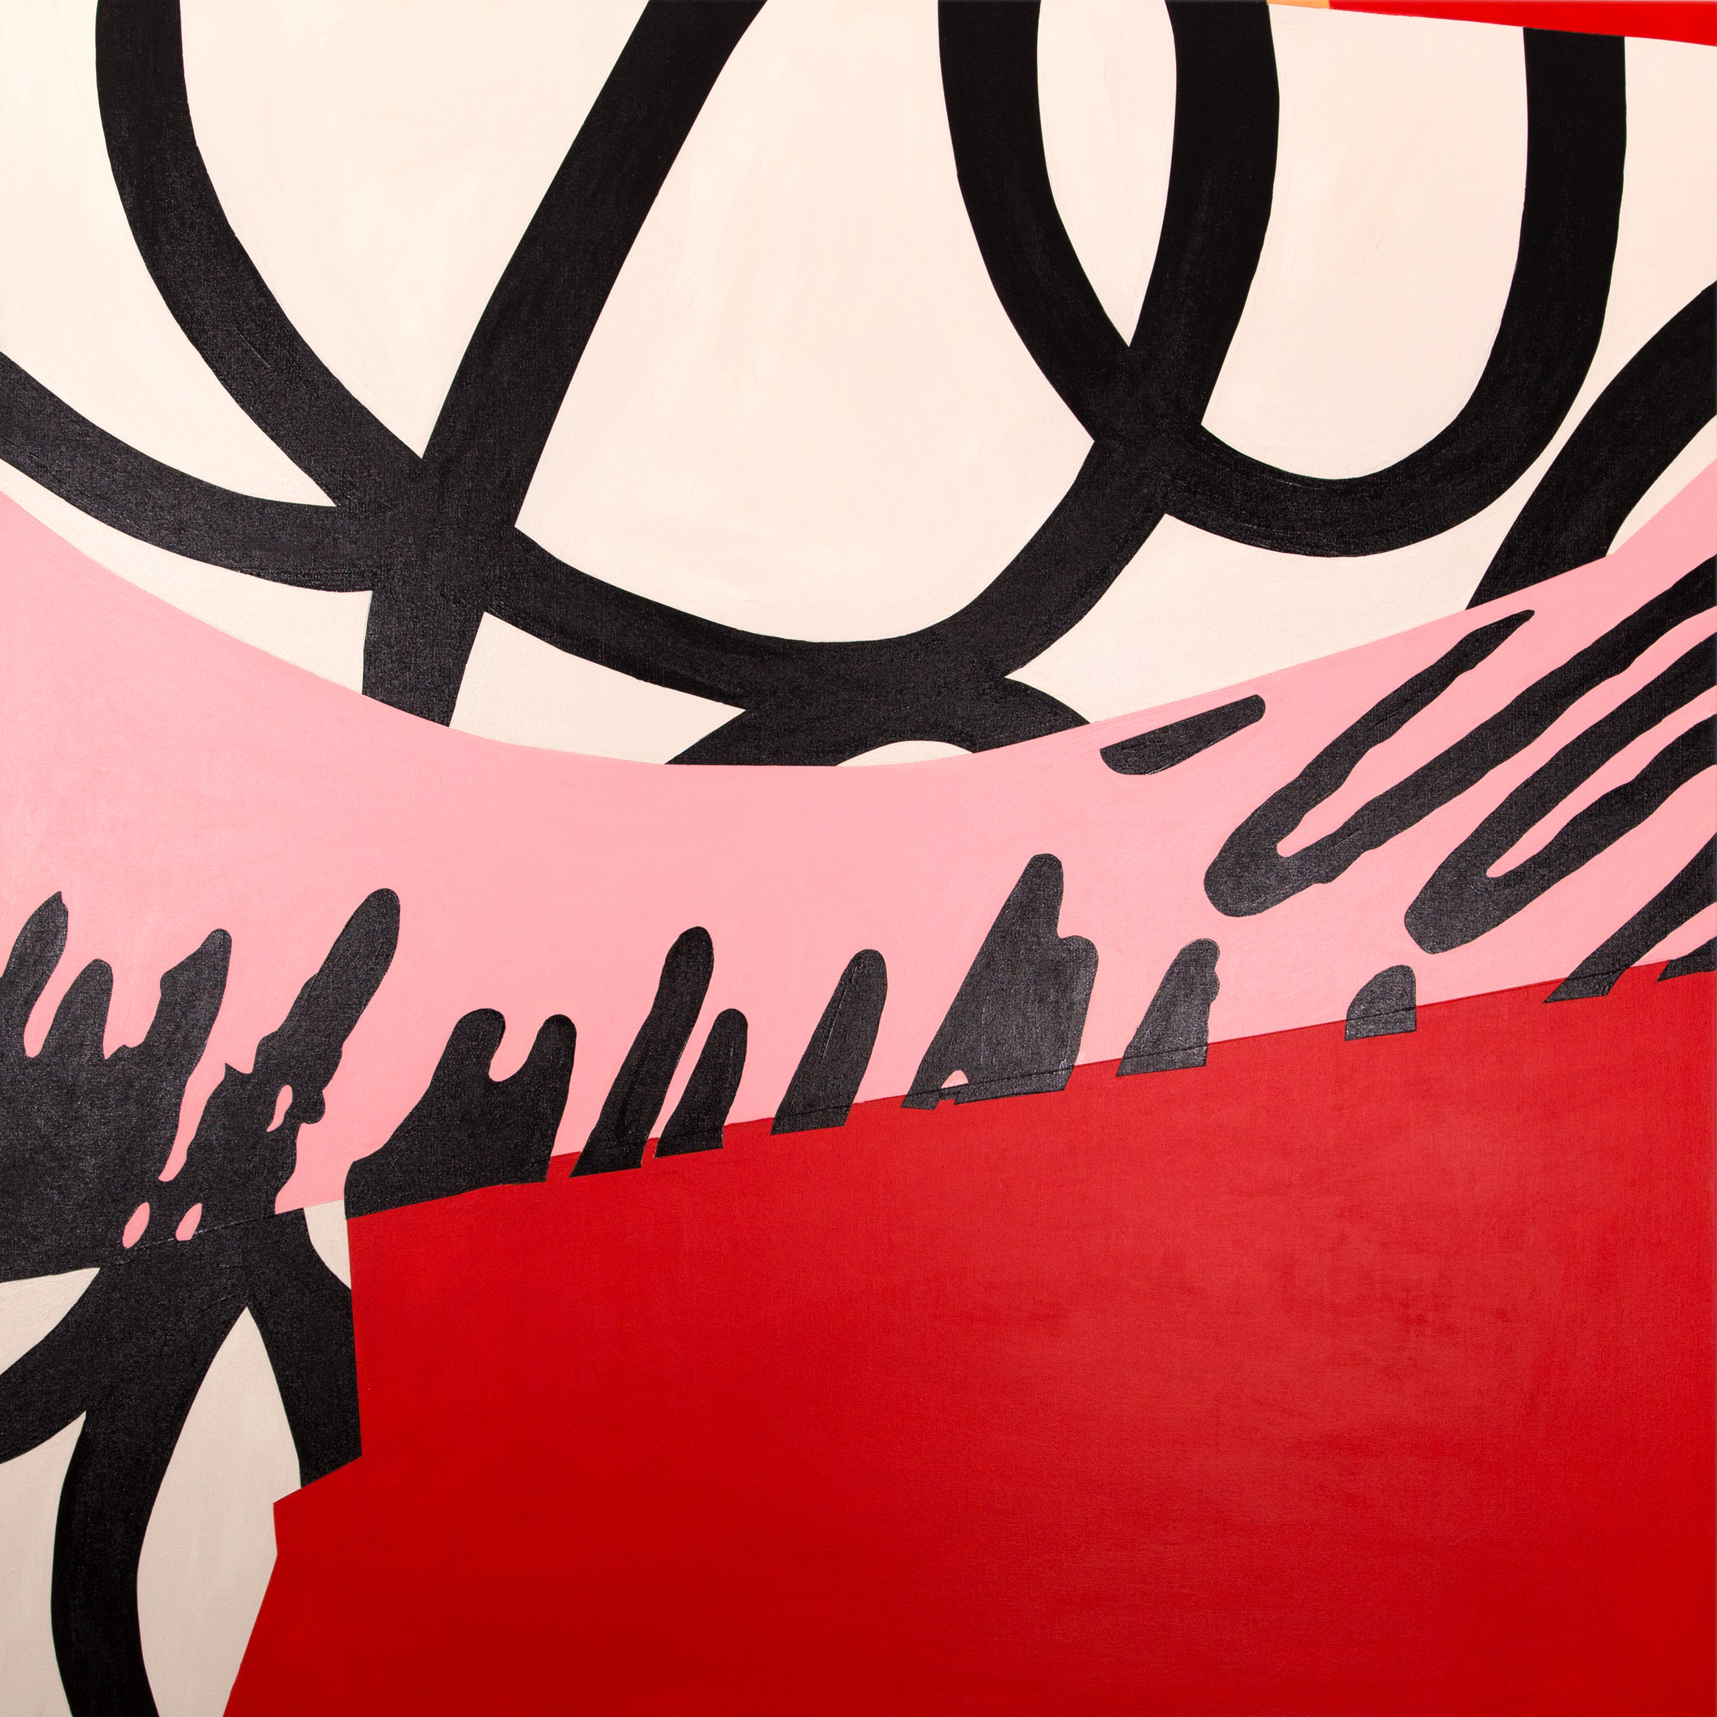 Loose Ends 06 Acrylic on canvas. 121x121cm